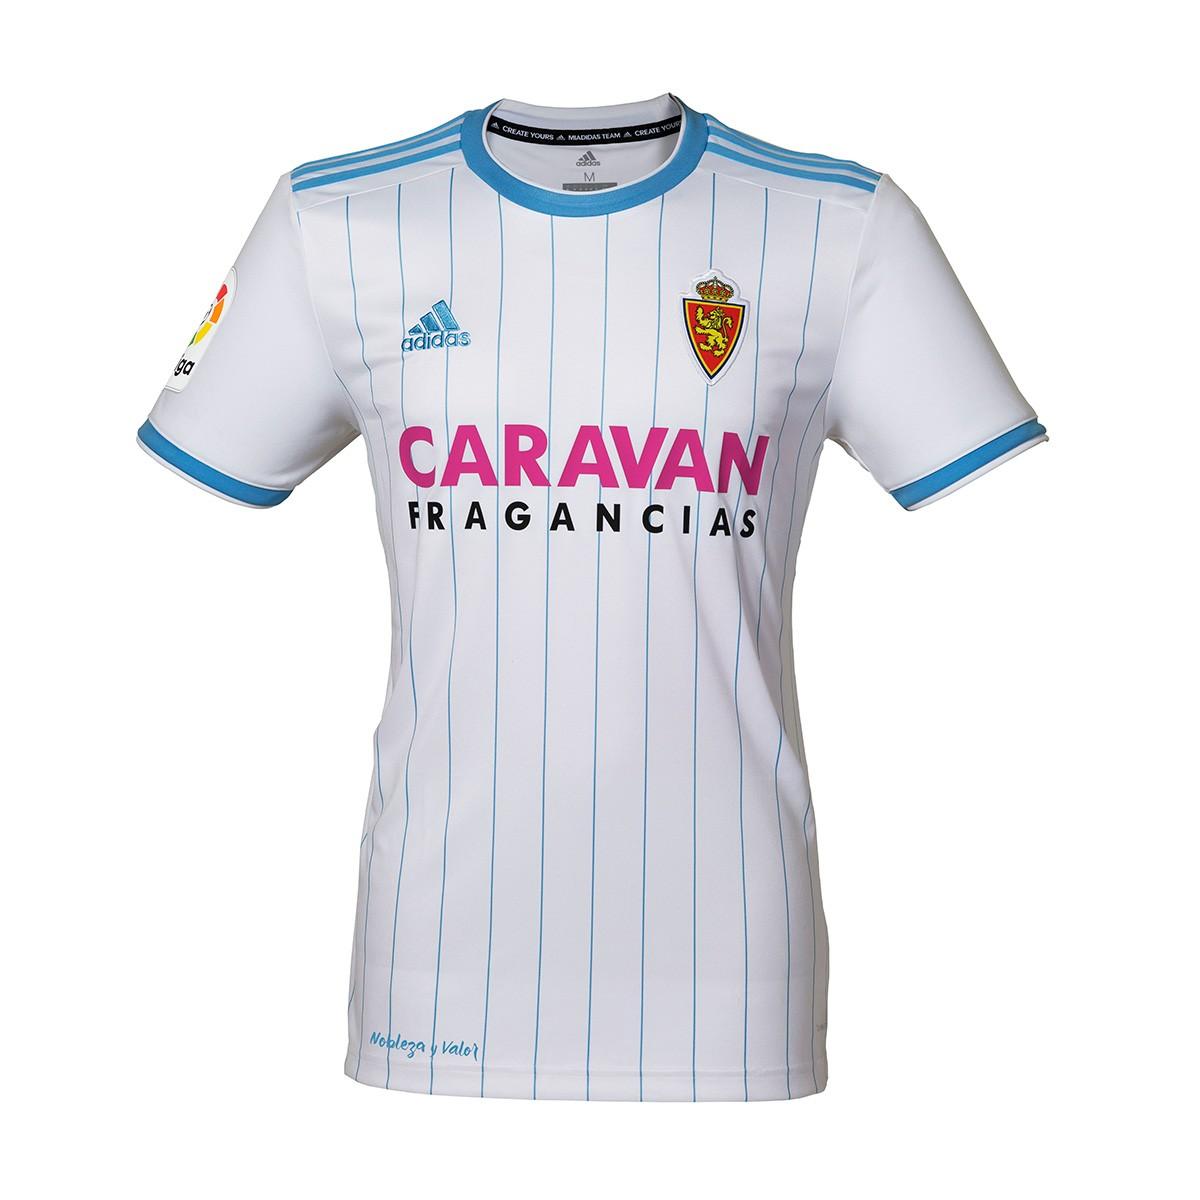 d88bc19d109b9 Camiseta adidas Real Zaragoza Primera Equipación 2018-2019 Niño White-Light  blue - Tienda de fútbol Fútbol Emotion